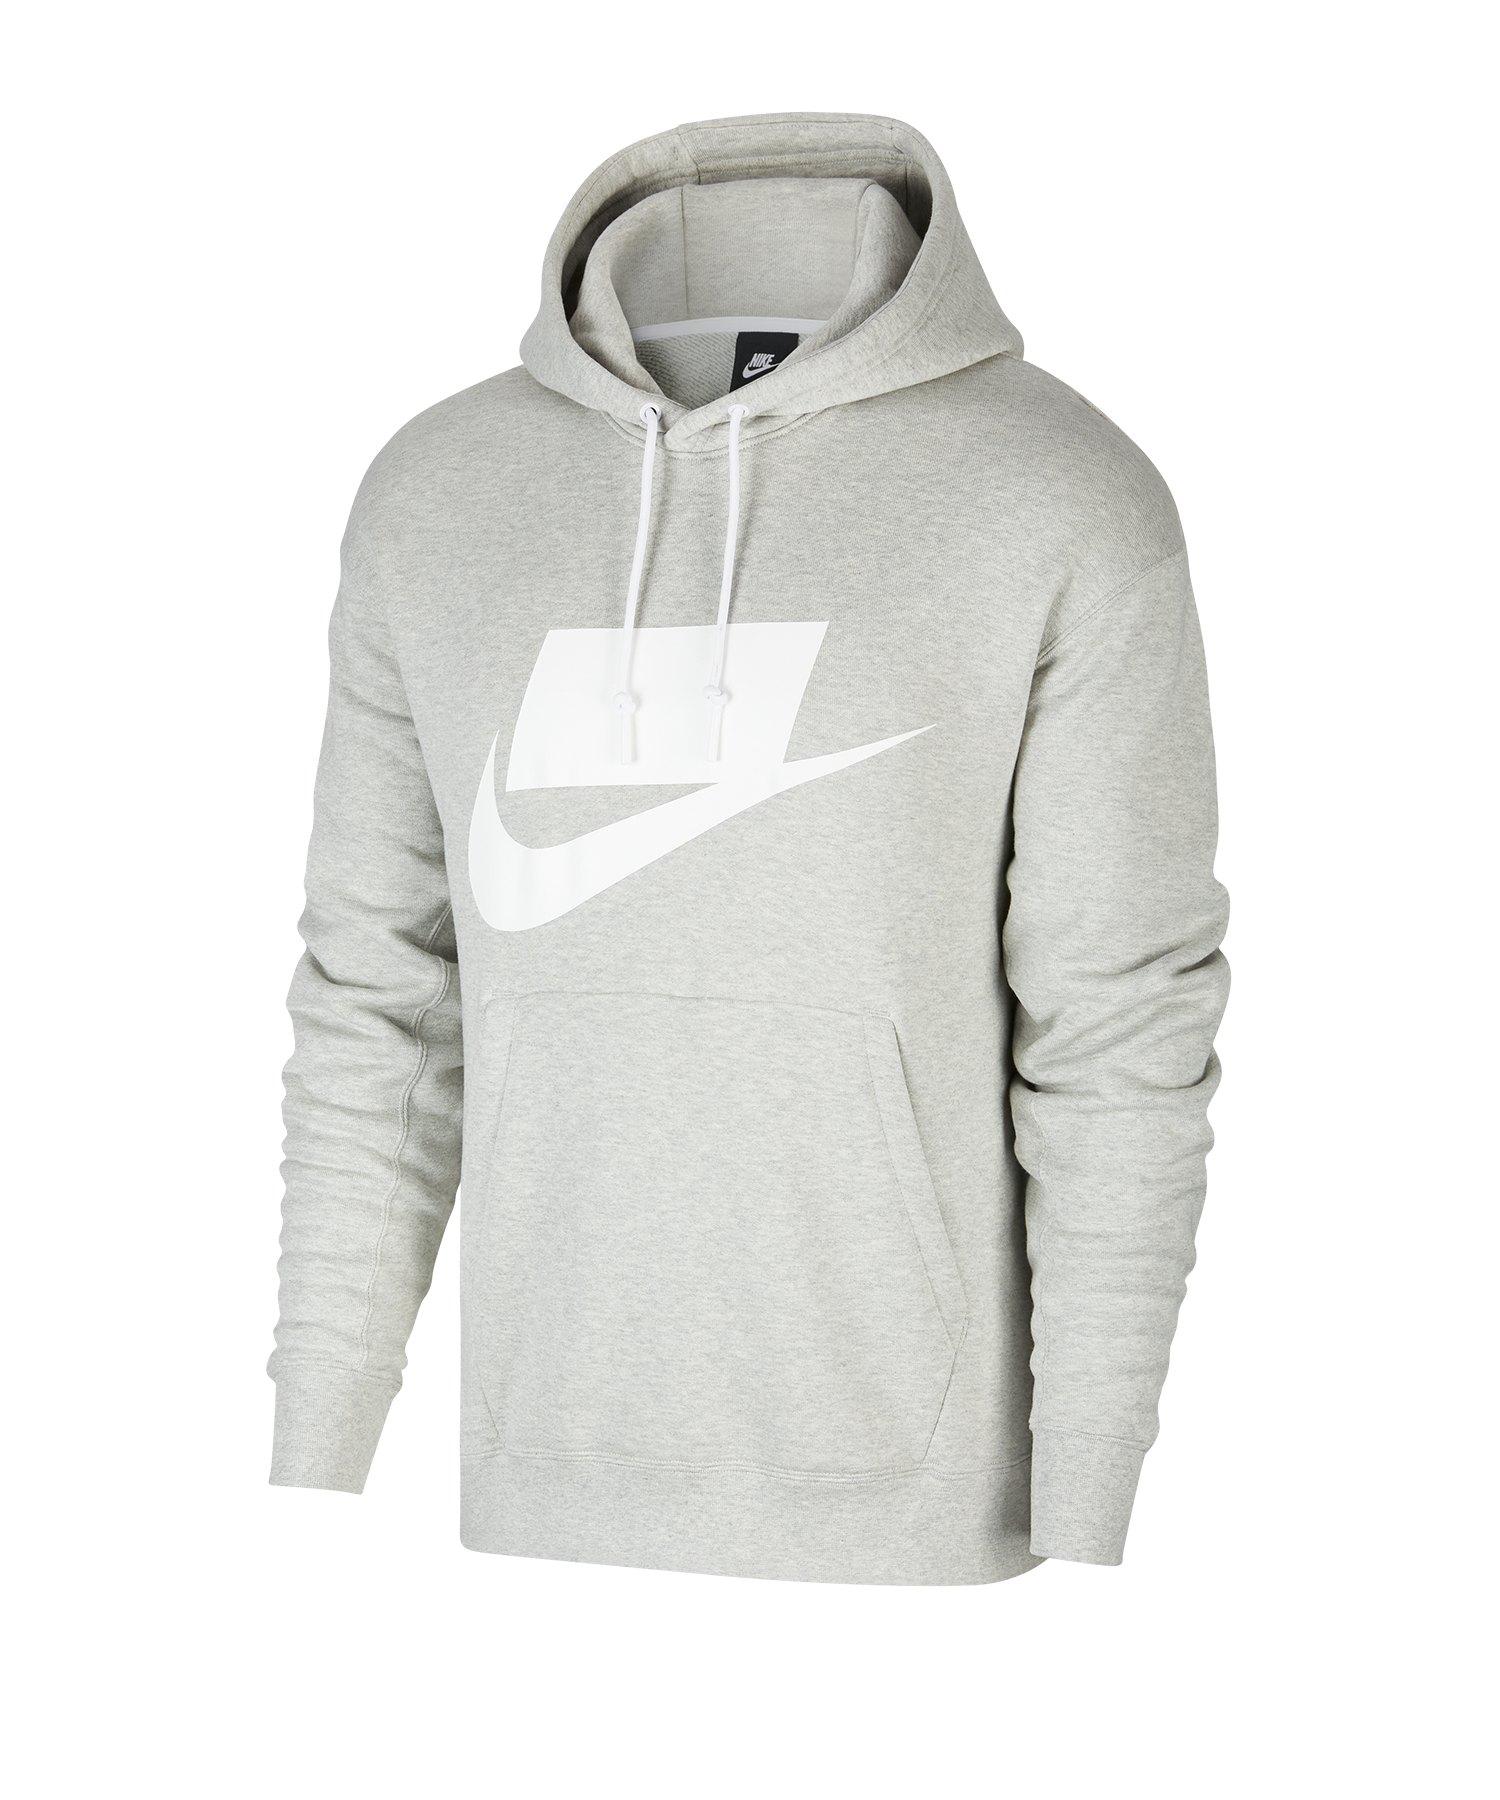 Nike French Terry Hoody Kapuzenpullover F050 - grau